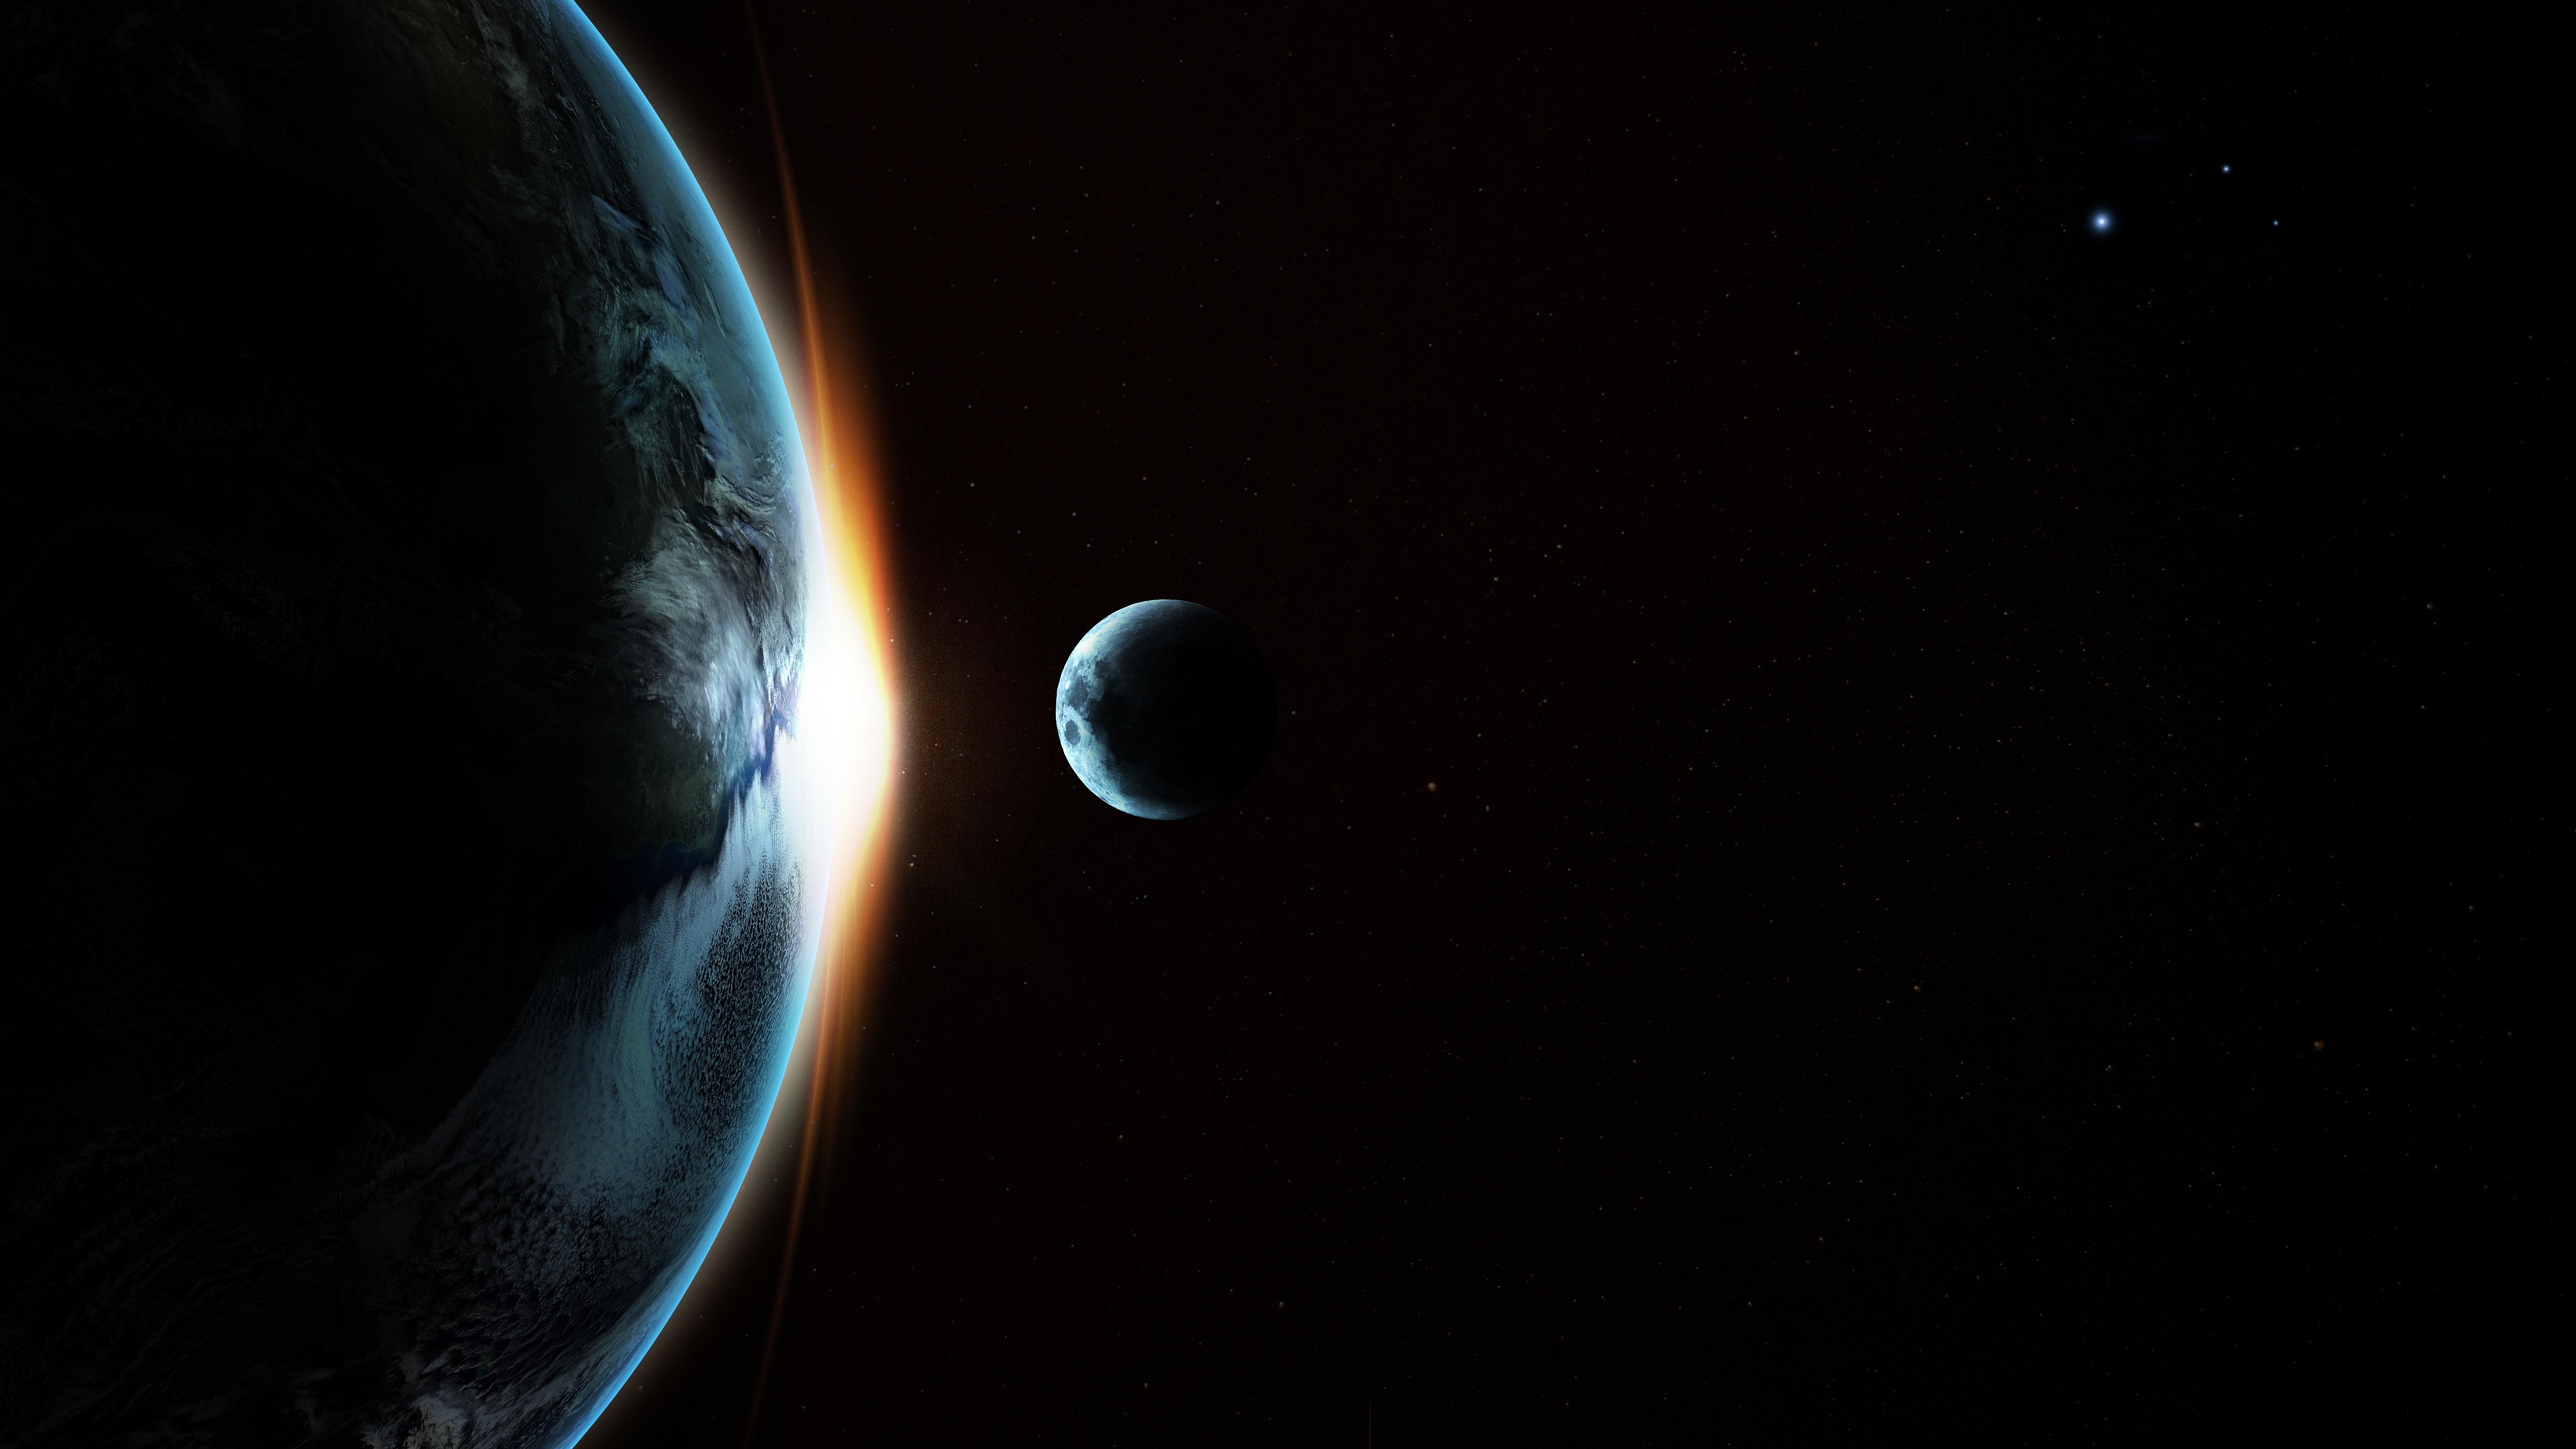 Wallpaper Earth Moon Transit Galaxy Ultra Hd Earth 4k 7680x4320 Wallpaper Teahub Io